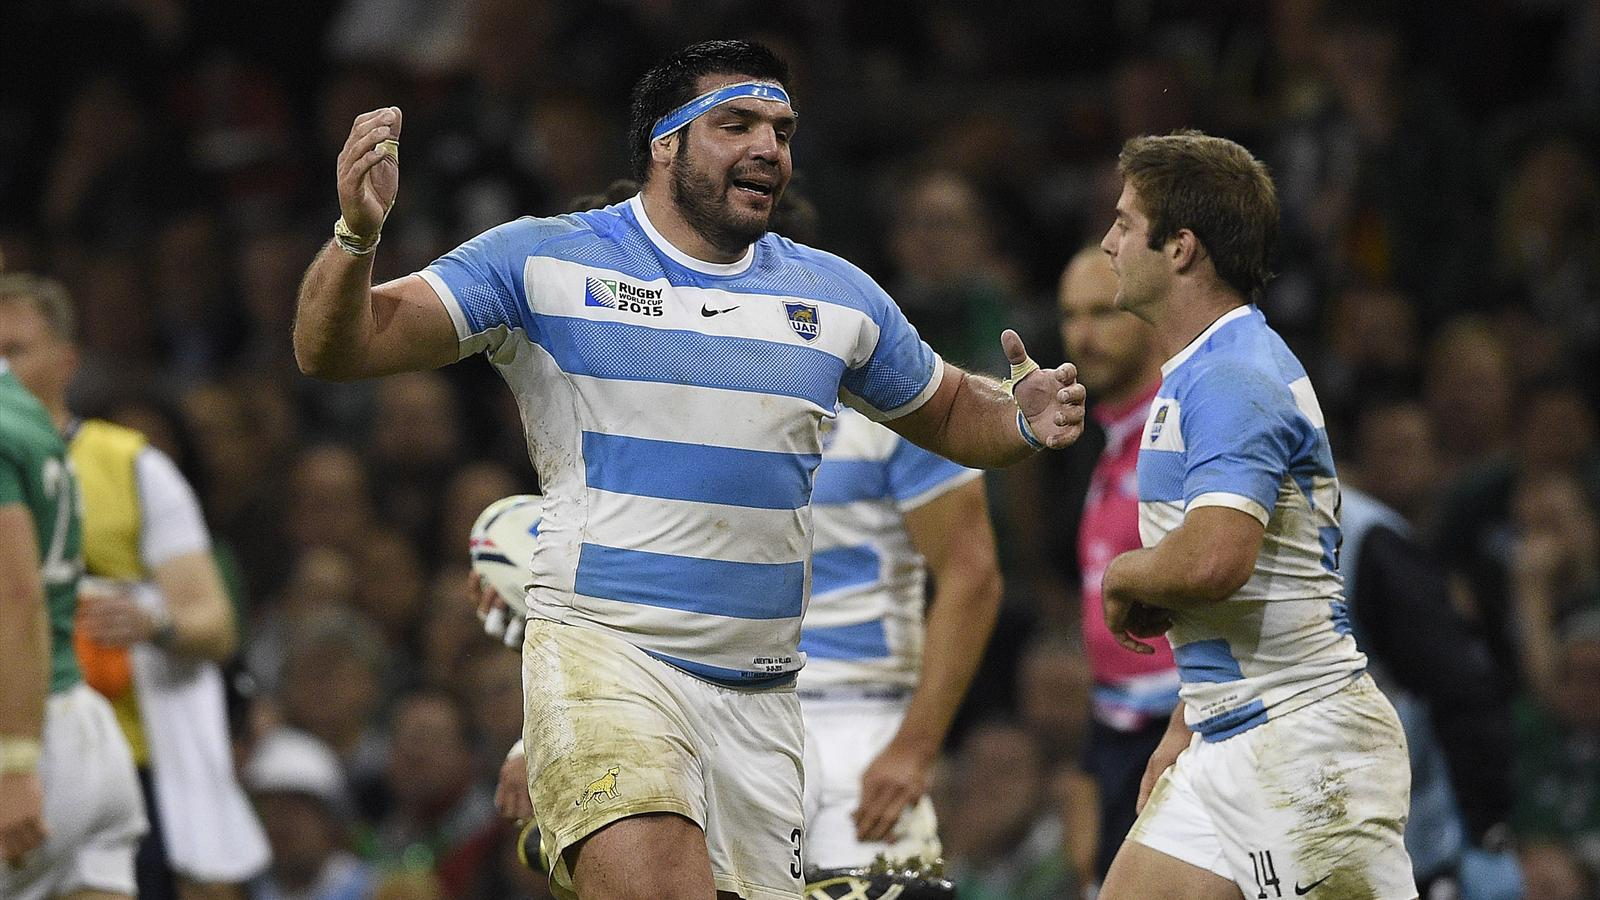 Le pilier argentin, Ramiro Herrera, a pris un gros risque contre l'Irlande - 18 octobre 2015